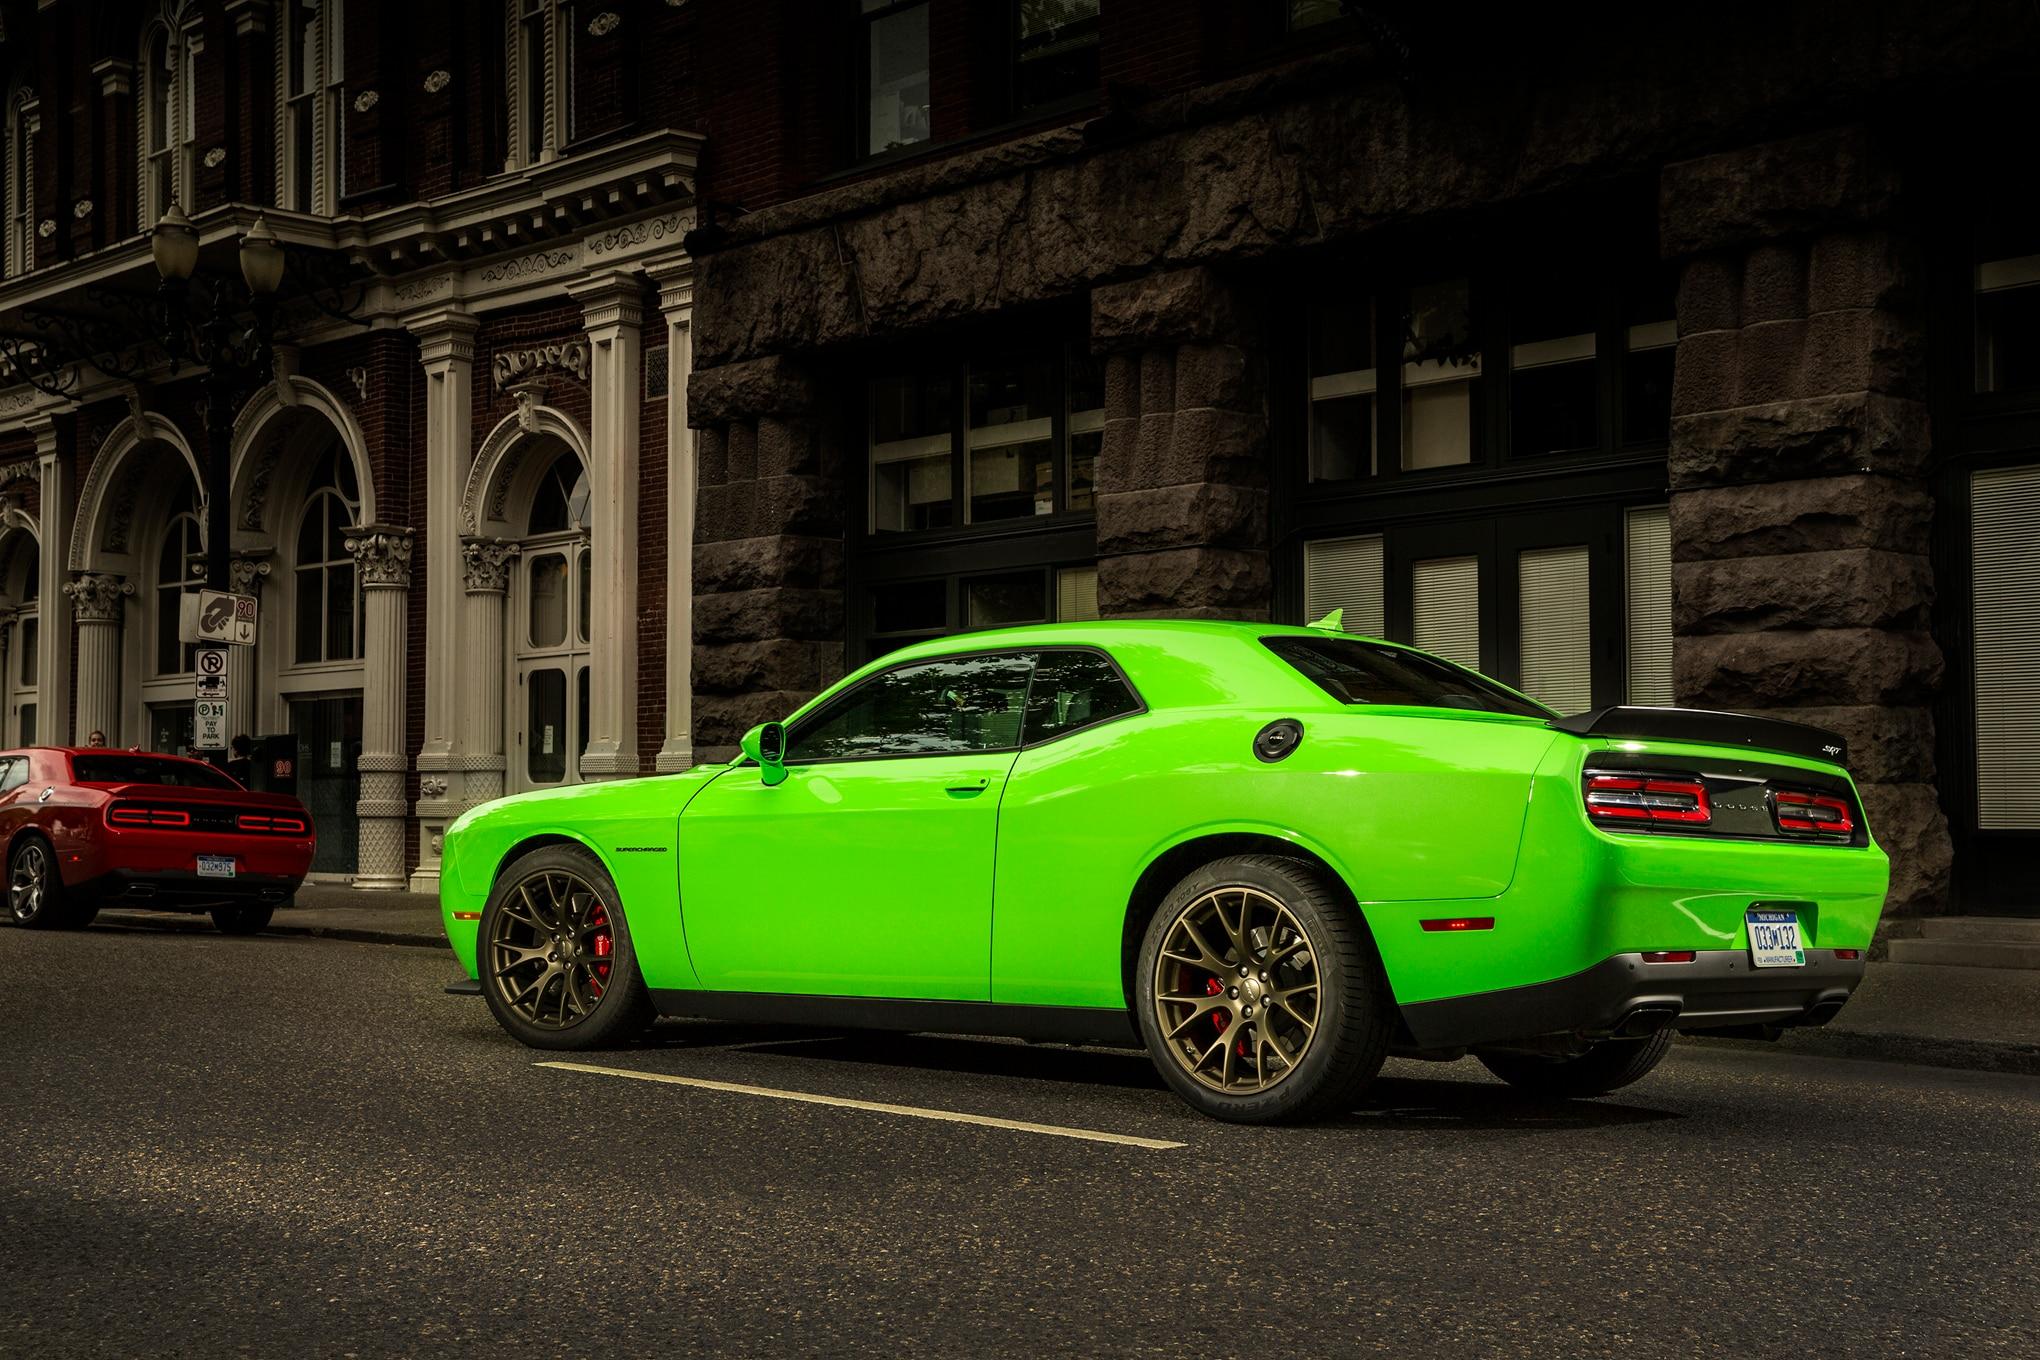 STEALTH Cat - Dodge Challenger SRT Hellcat - 6SpeedOnline - Porsche Forum and Luxury Car Resource